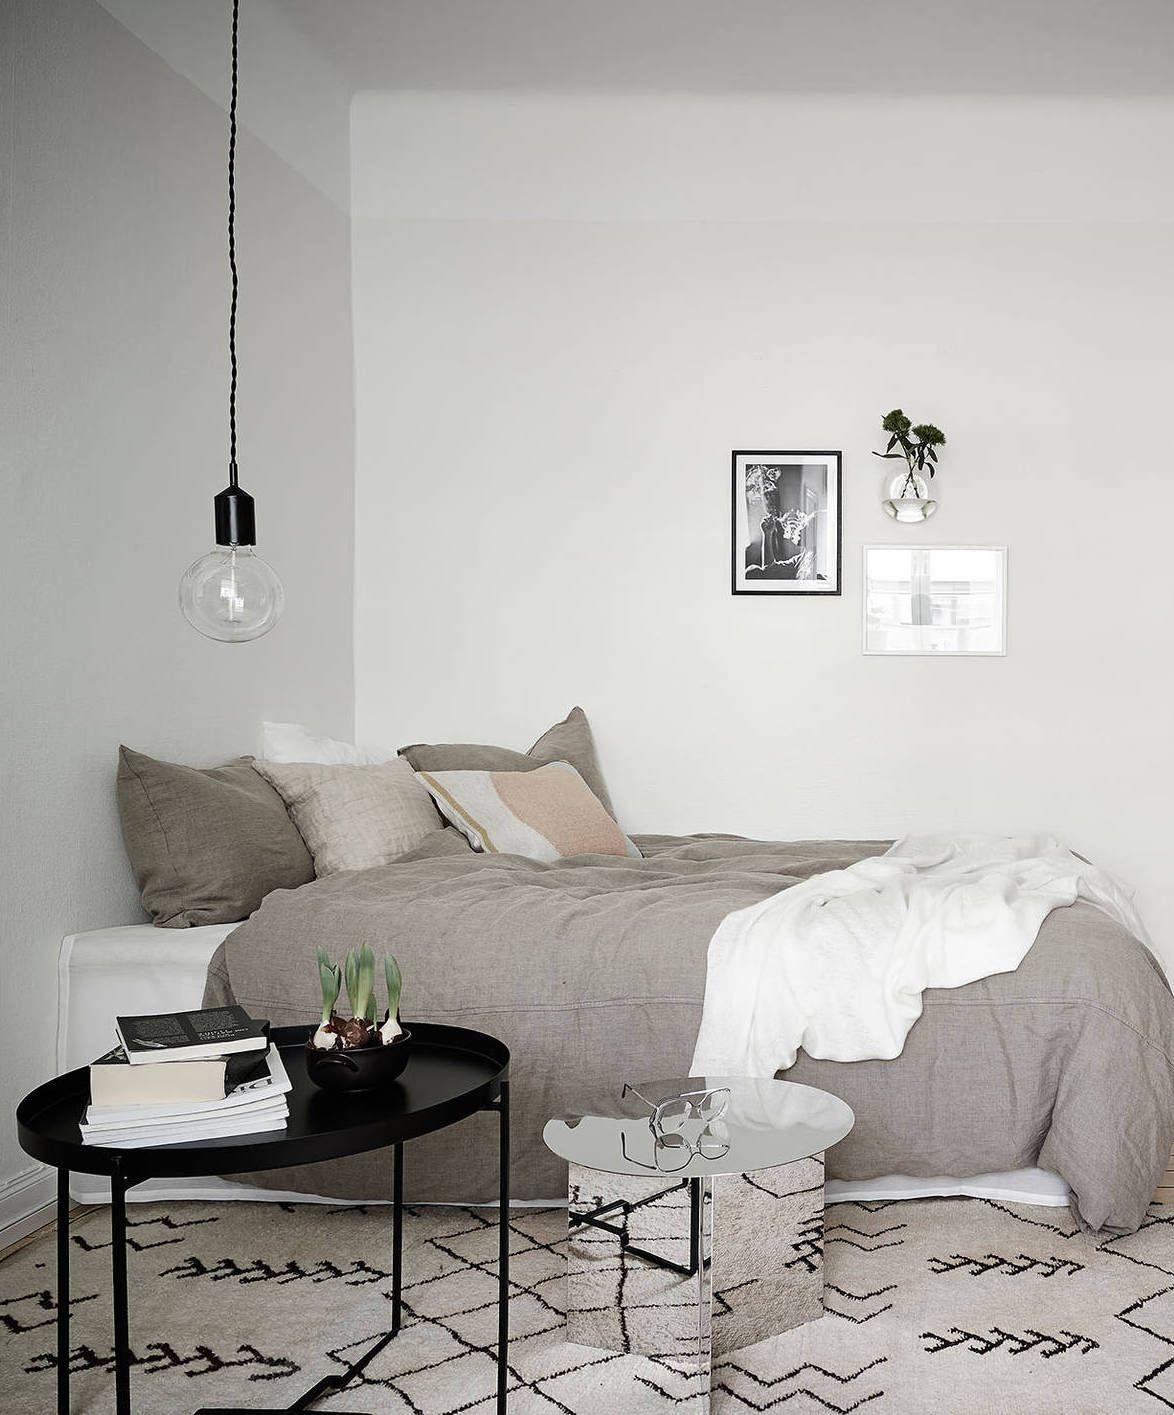 Photo of Charming flat – COCO LAPINE DESIGN